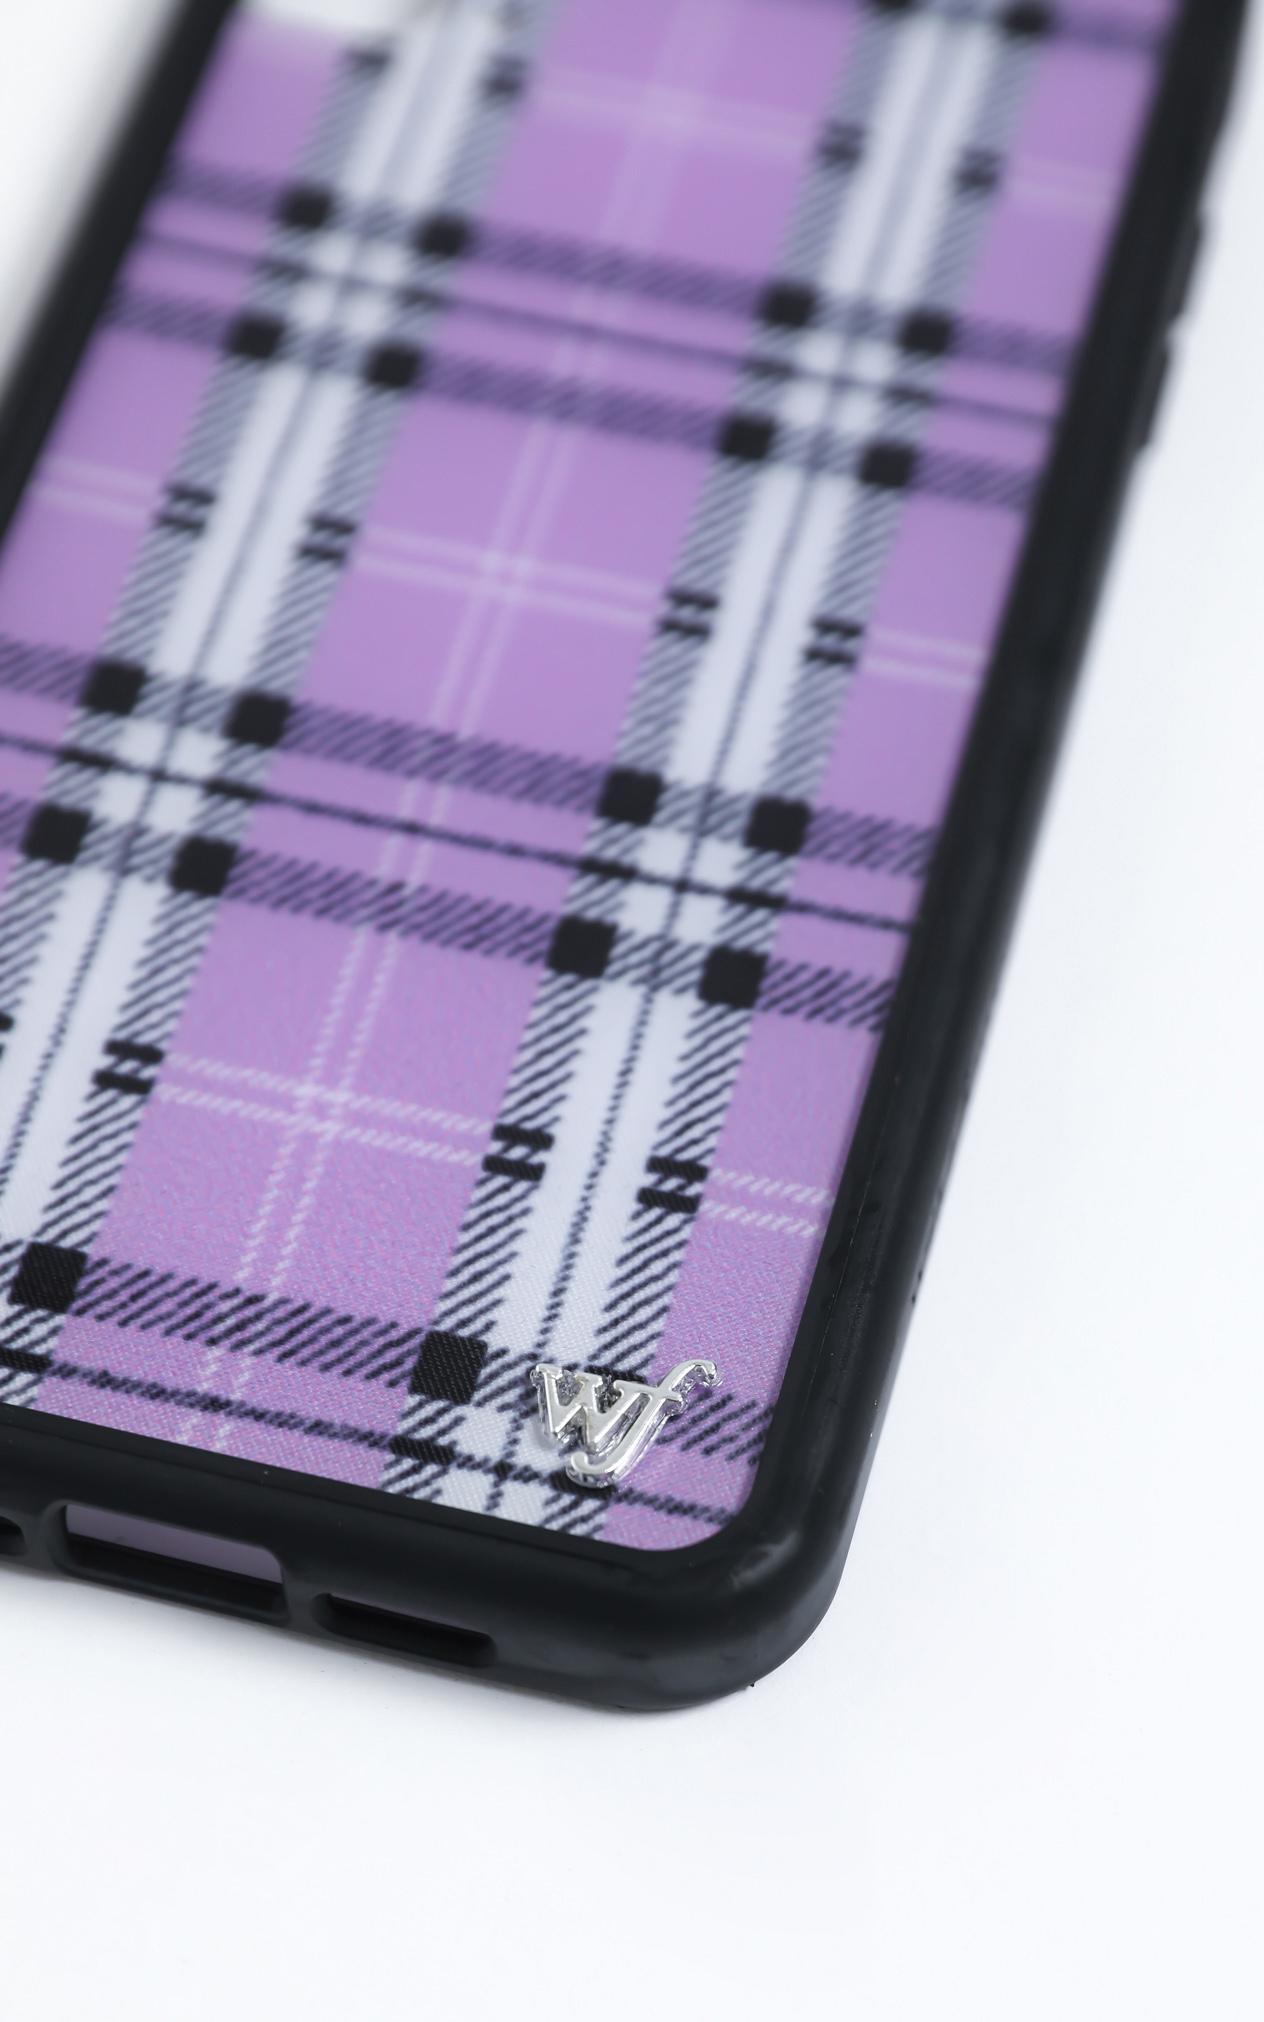 Wildflower - Iphone Case in Lavender Plaid - 8 Plus, Purple, hi-res image number null